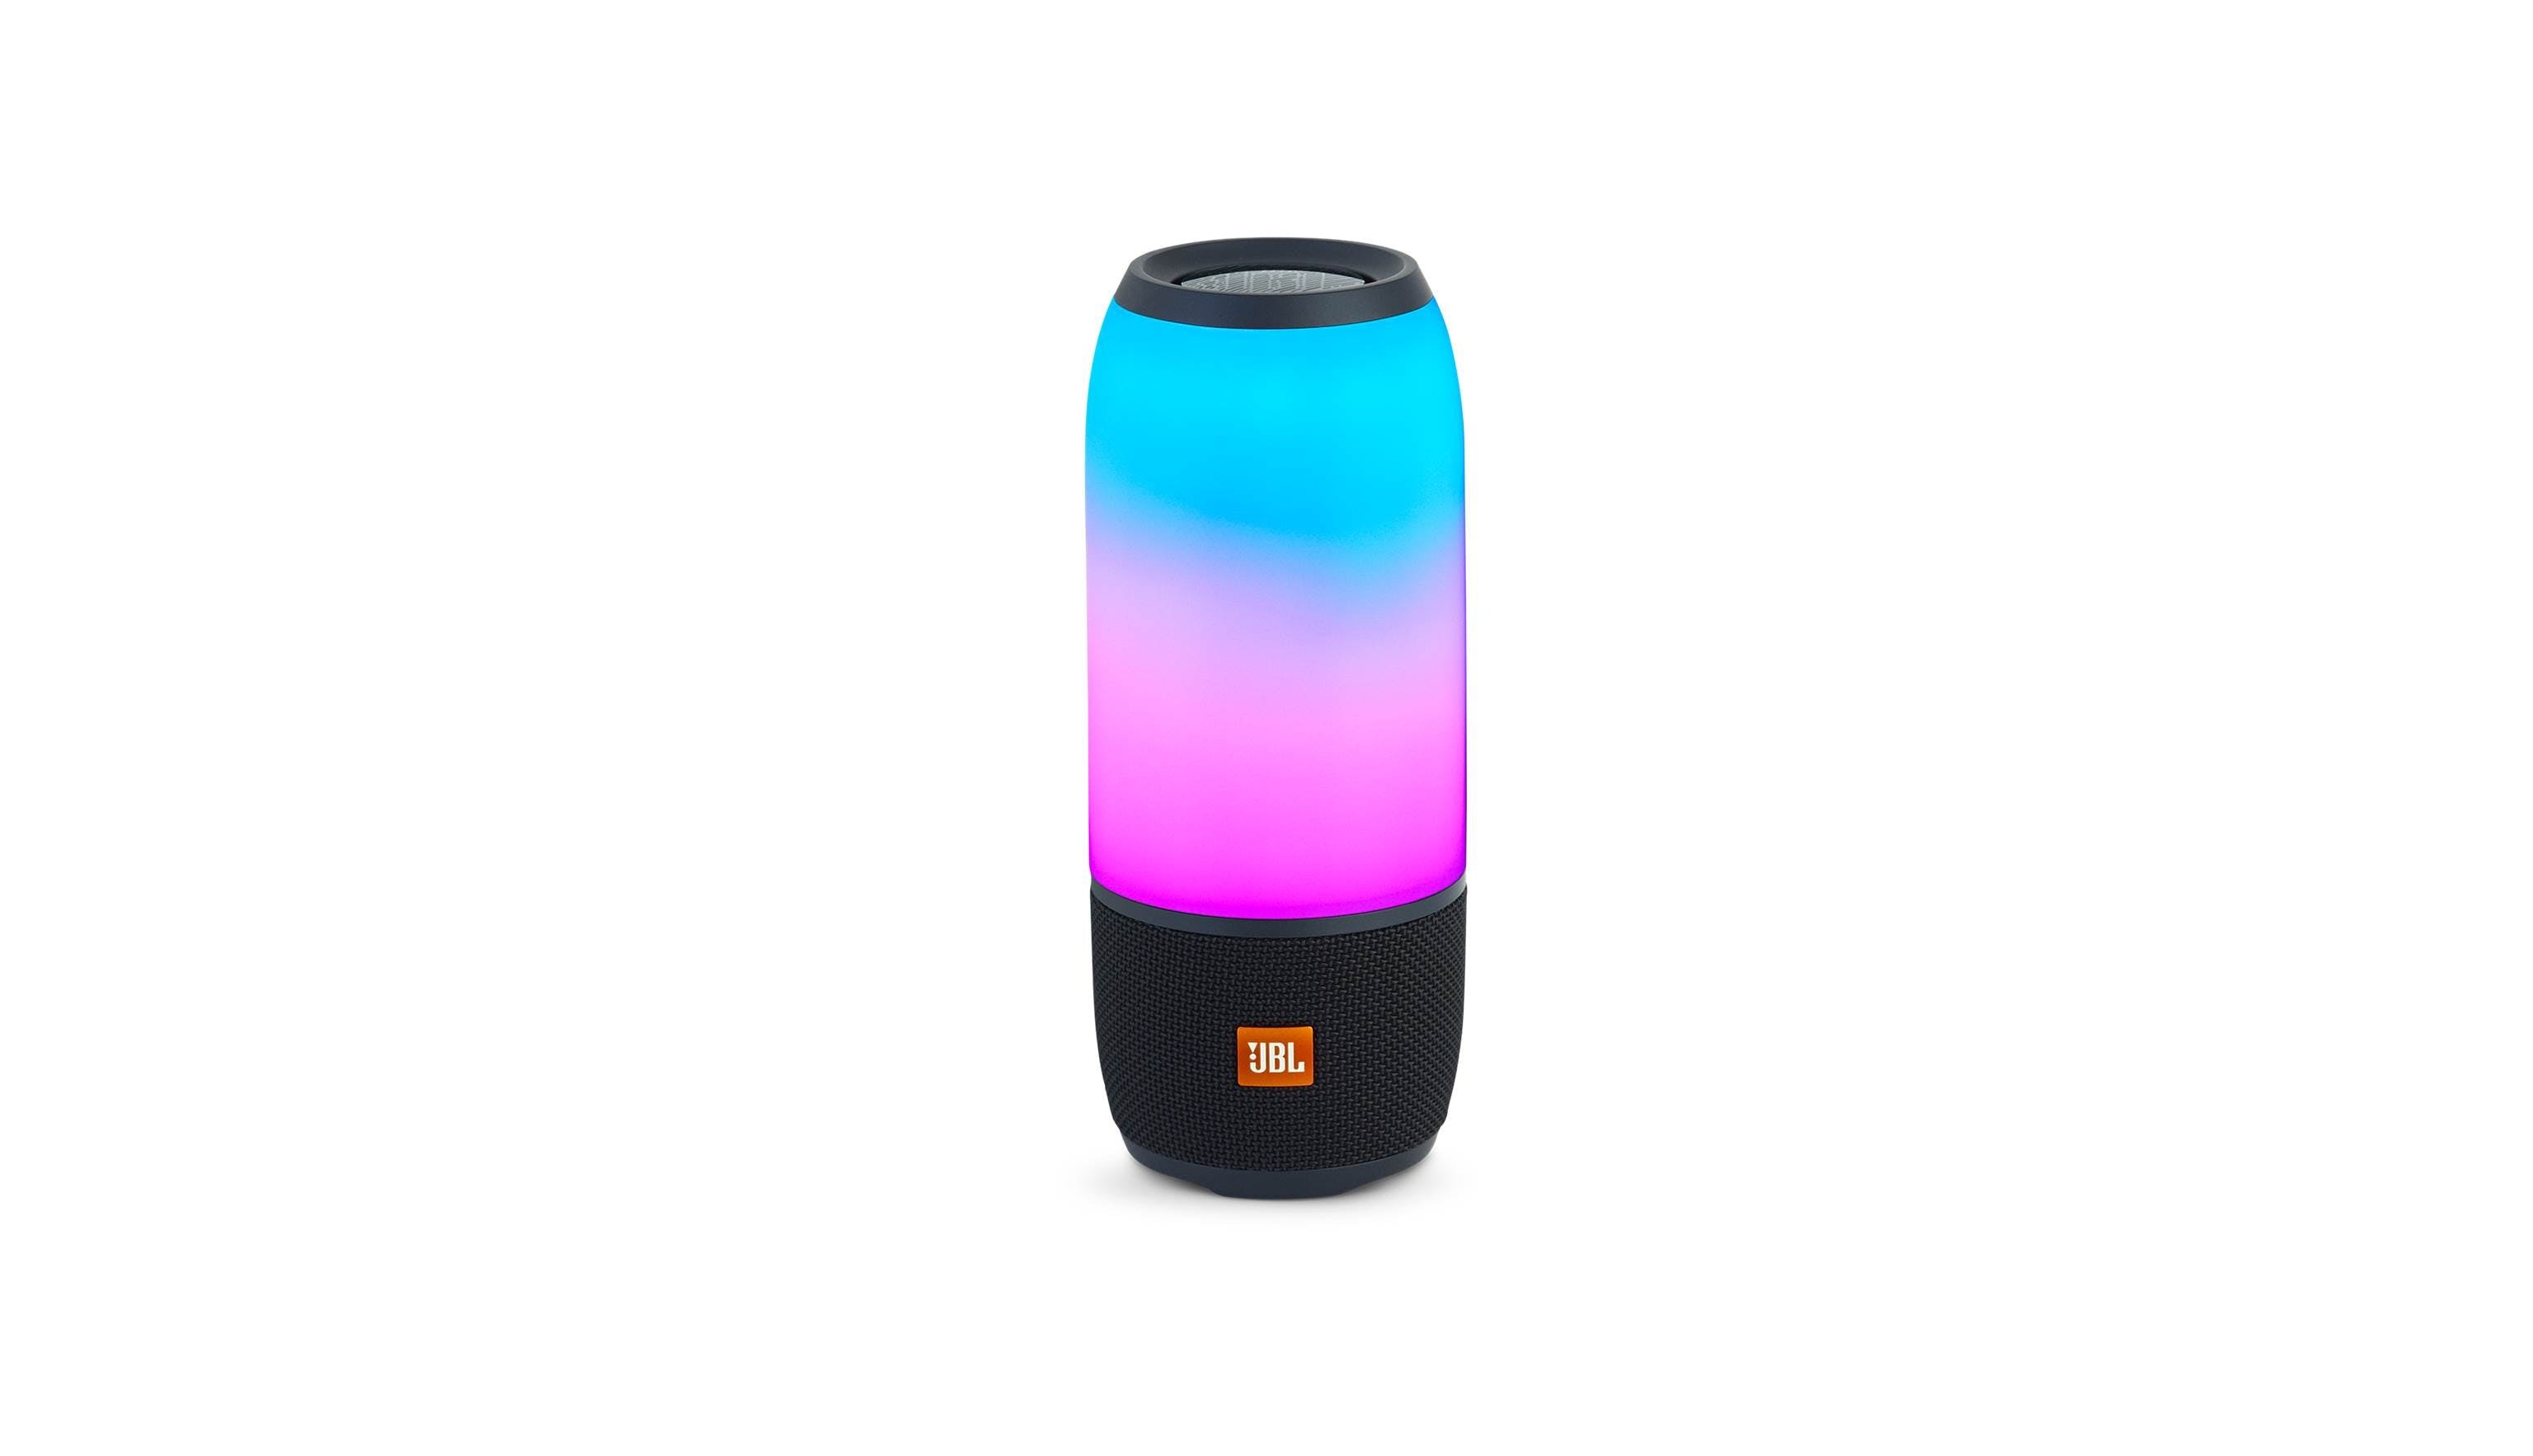 Jbl Bluetooth Speaker Portable Latest Price Dealers Charge Mini 2 Plus Wireless Smartphone Aux Pulse 3